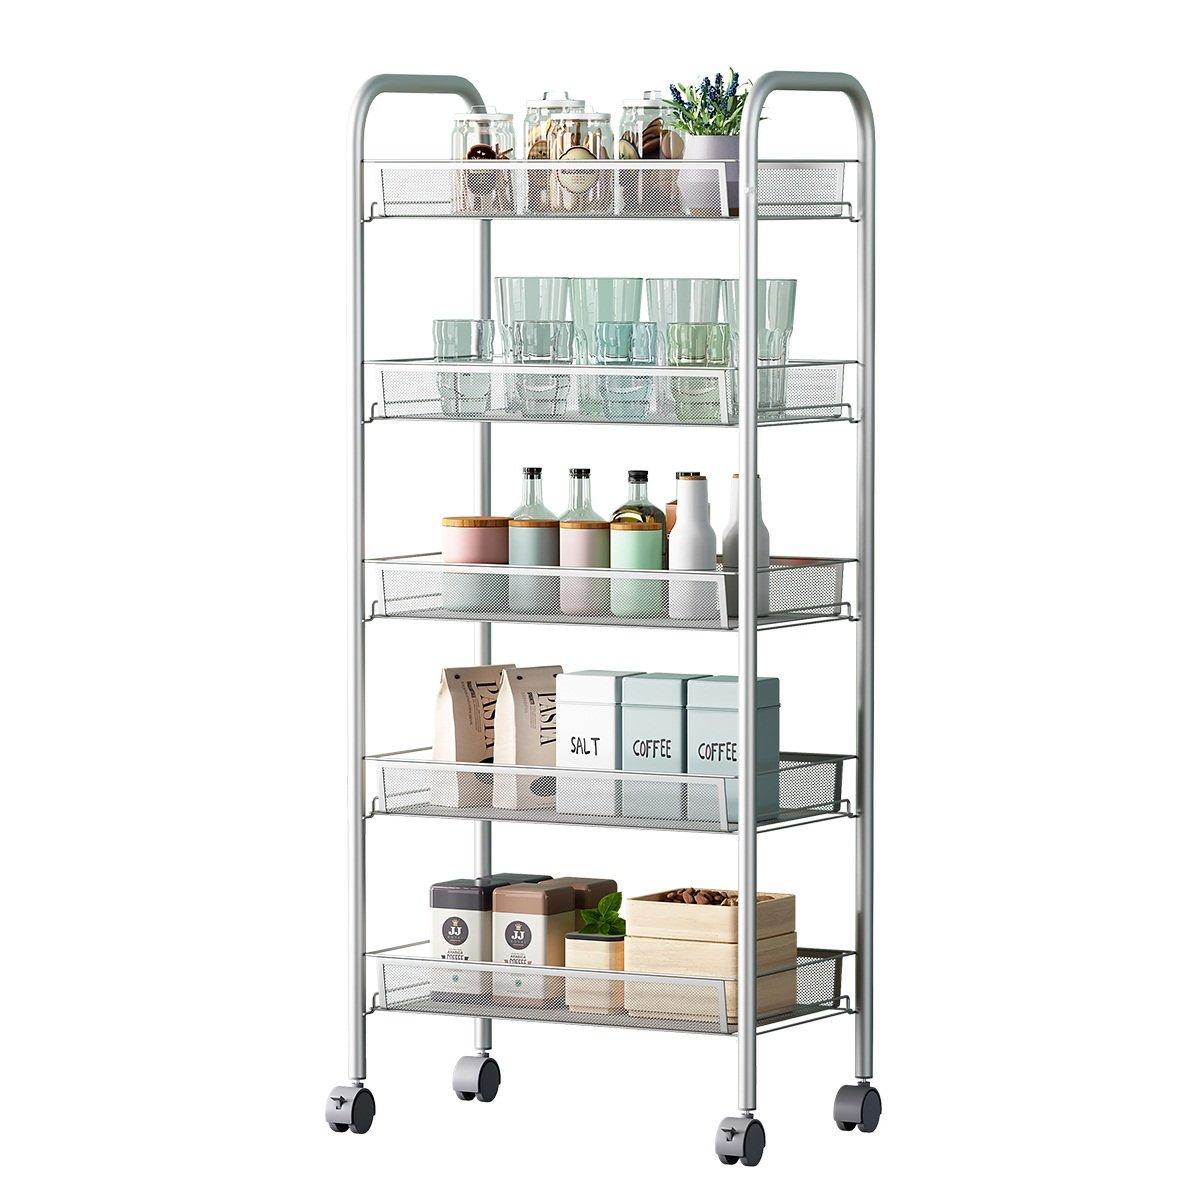 5-Shelf D25.8cm W44.5cm H103cm Silver Steel Storage Rack Basket Shelving Unit Trolley Cabinet Kitchen Island with Caster Wheels WJM46104-5SL